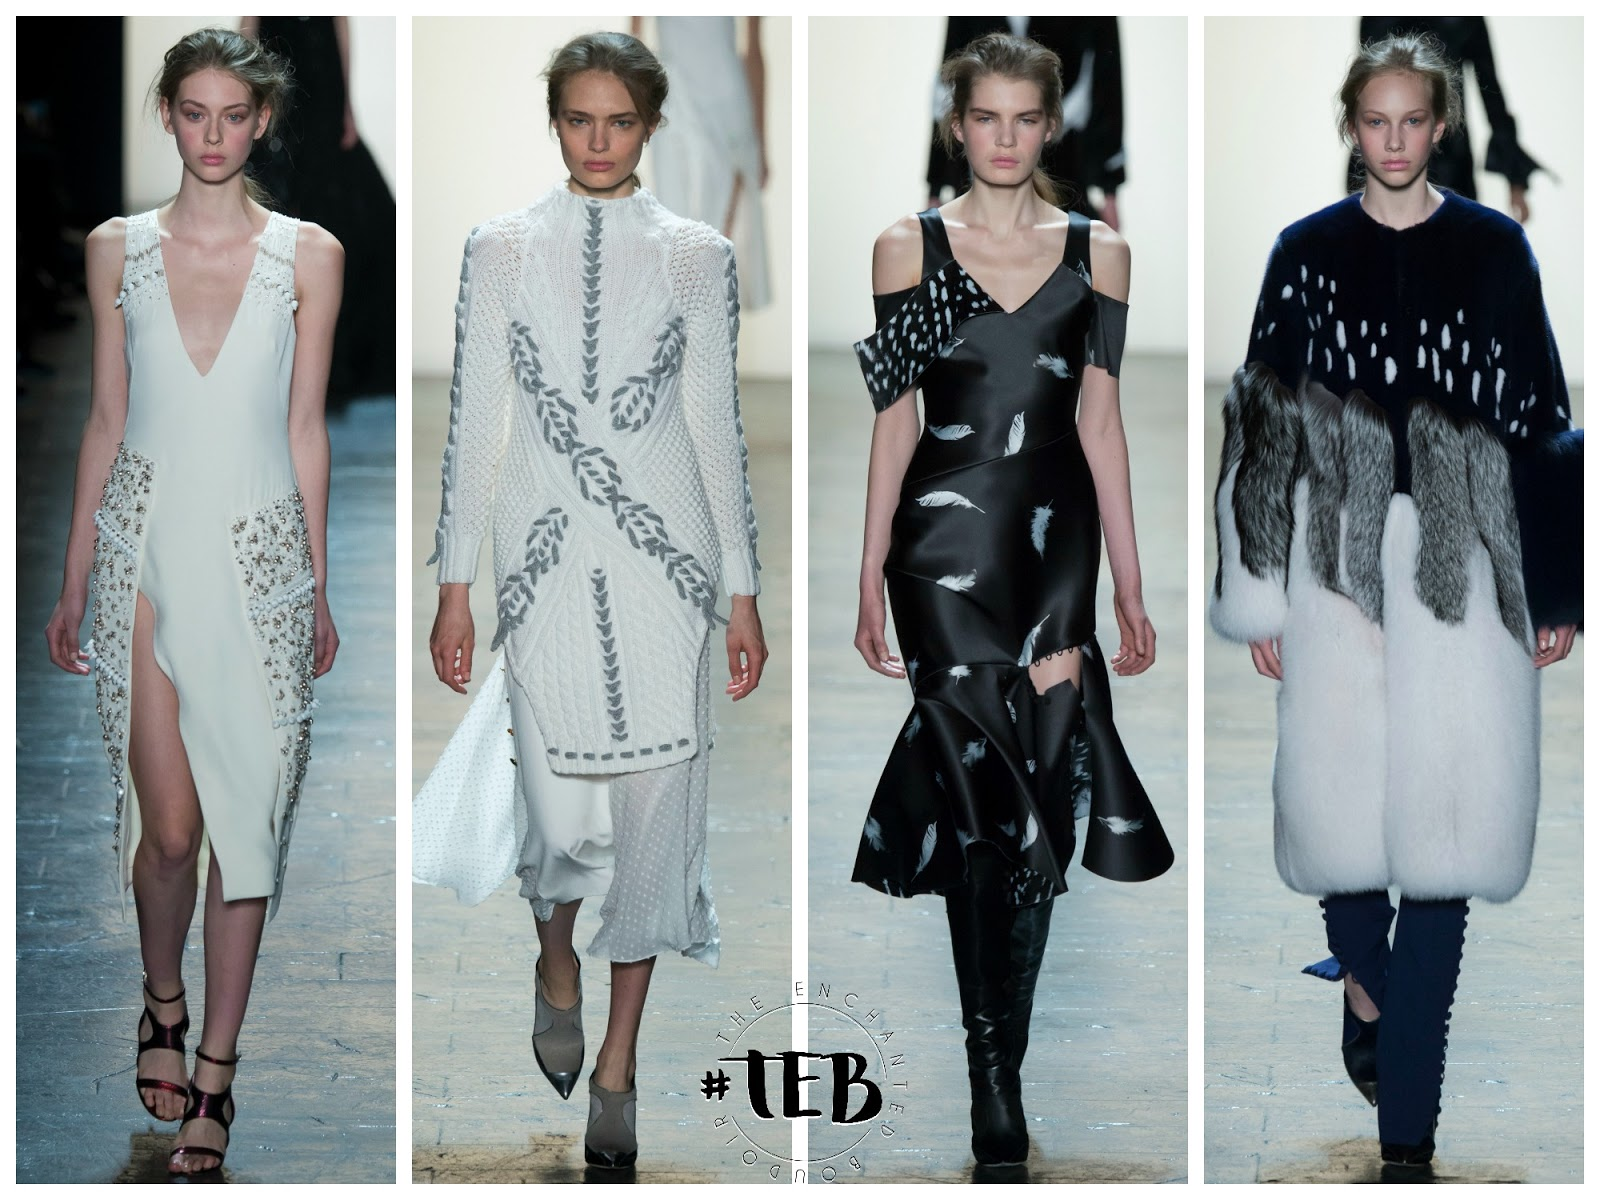 prabal-gurung-fashion-show-collection-fall-winter-16